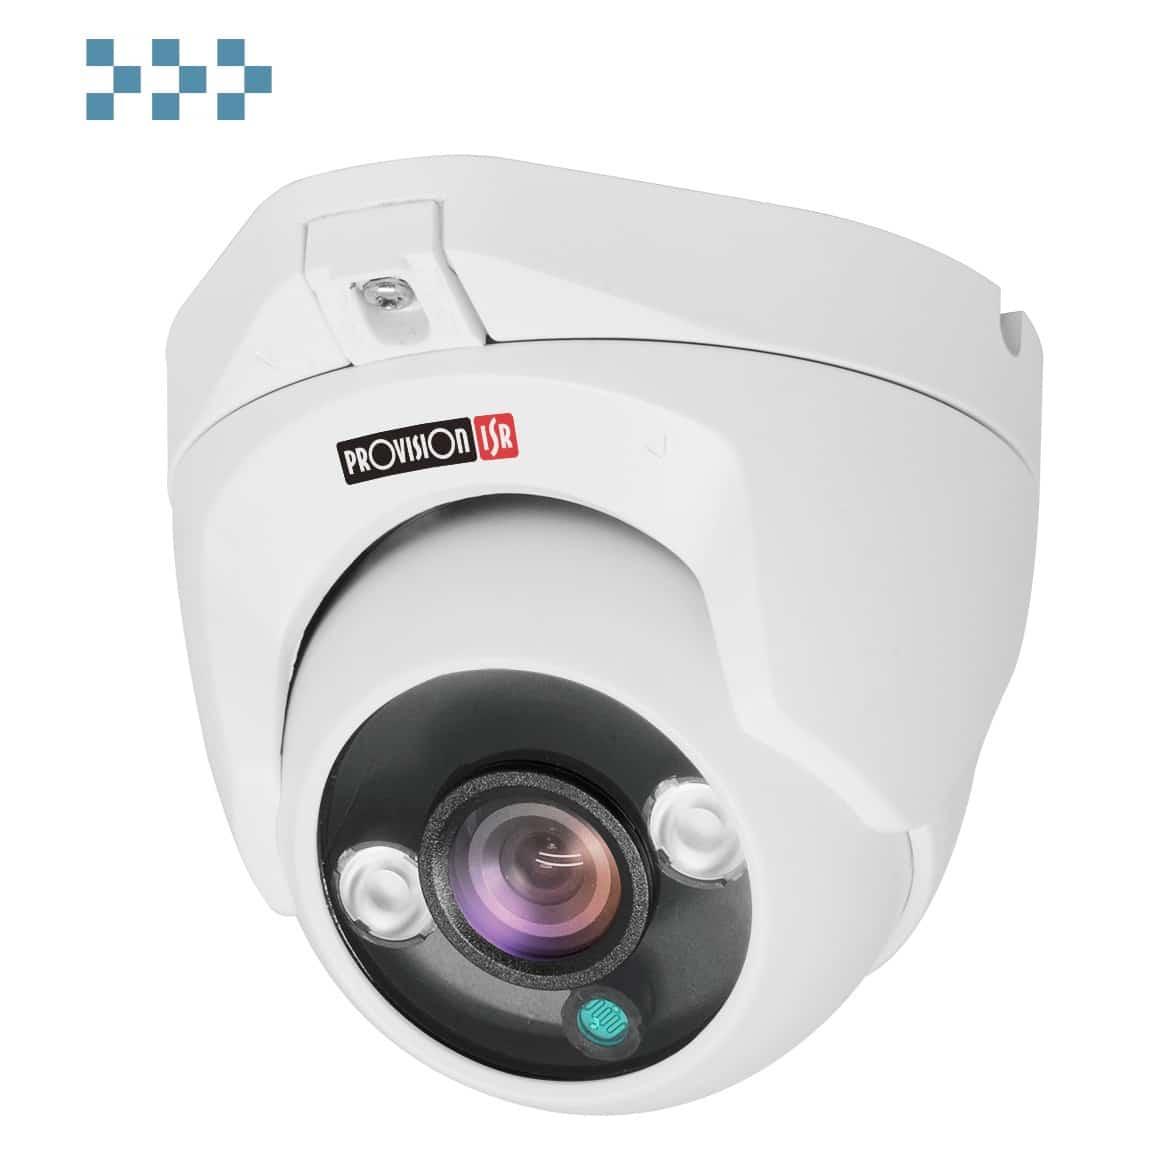 AHD камера Provision-ISR DI-390A36